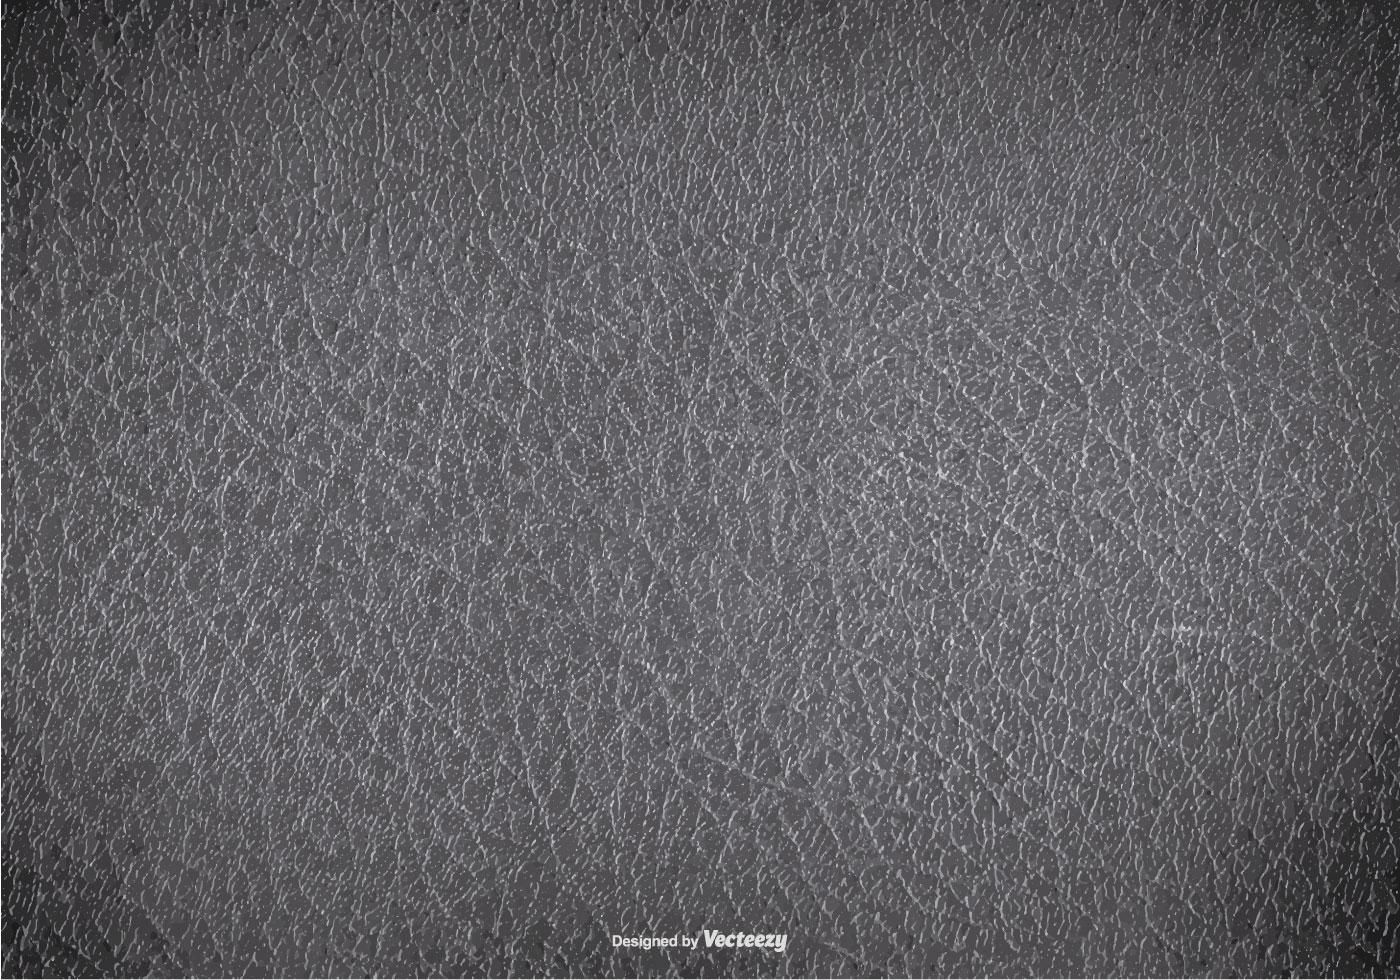 Leather Vector Texture Download Free Vector Art Stock